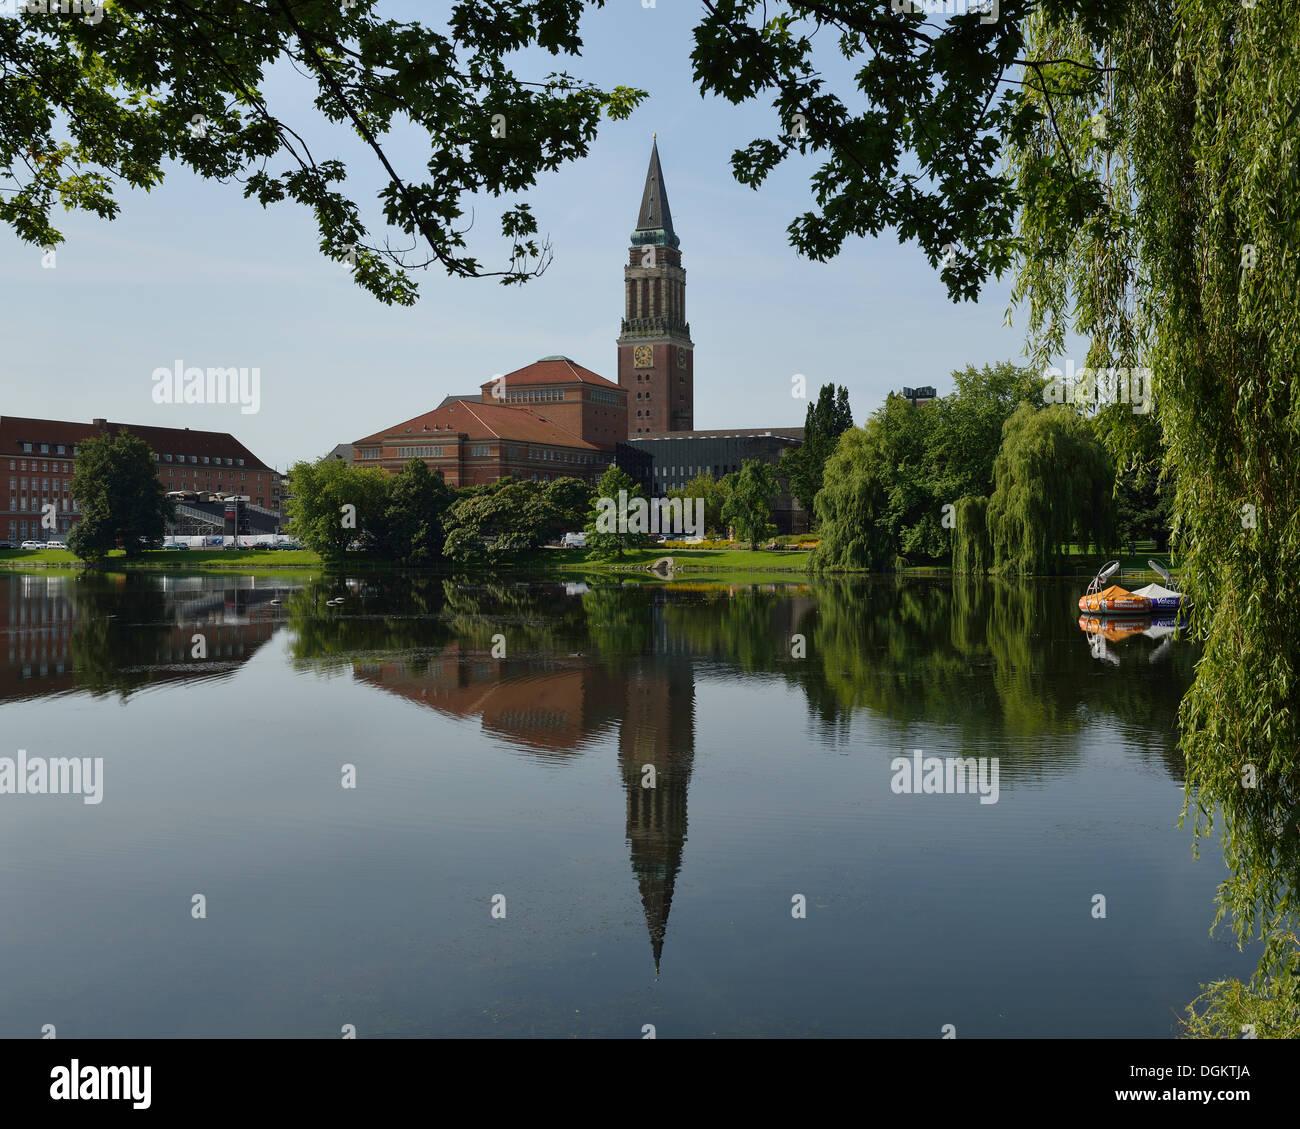 Kleiner Kiel lake in front of Kiel City Hall behind the landmark City Hall Tower, Kiel, Schleswig-Holstein, PublicGround - Stock Image